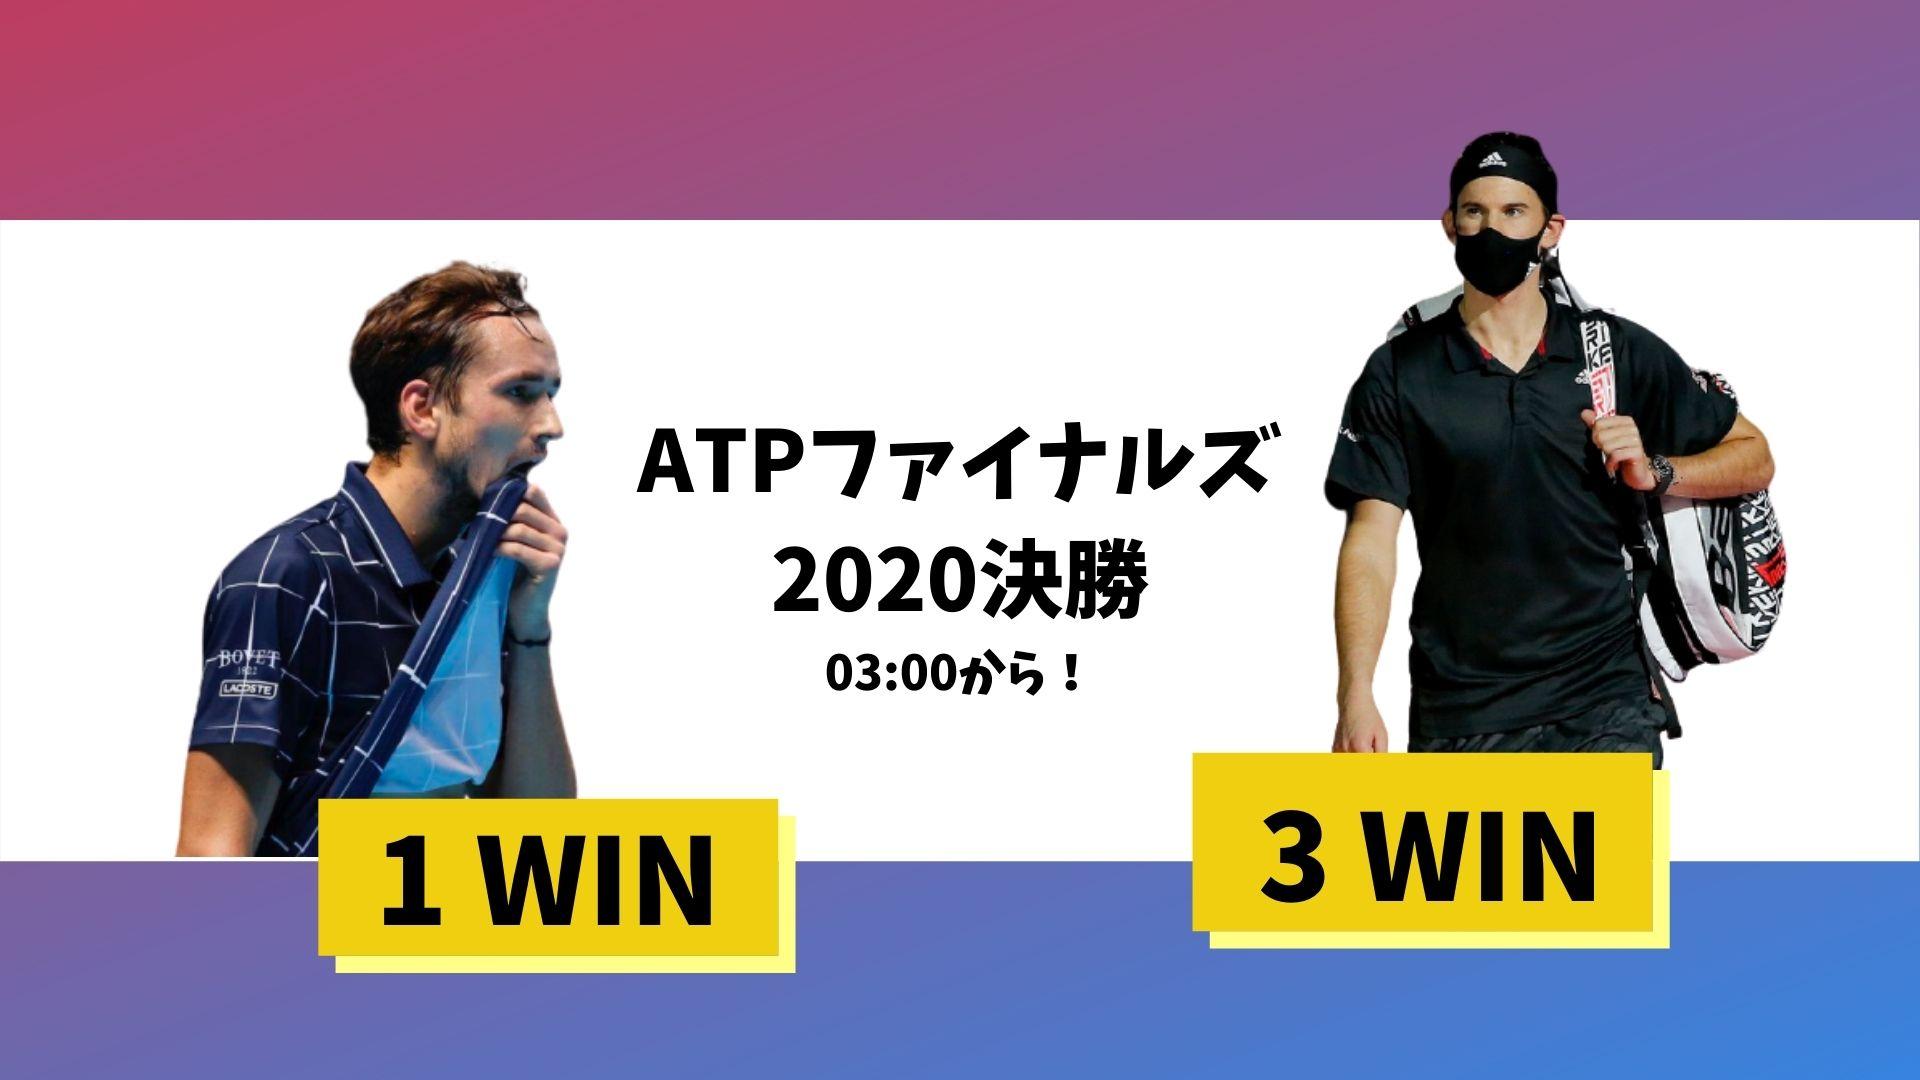 ATPファイナルズ2020決勝